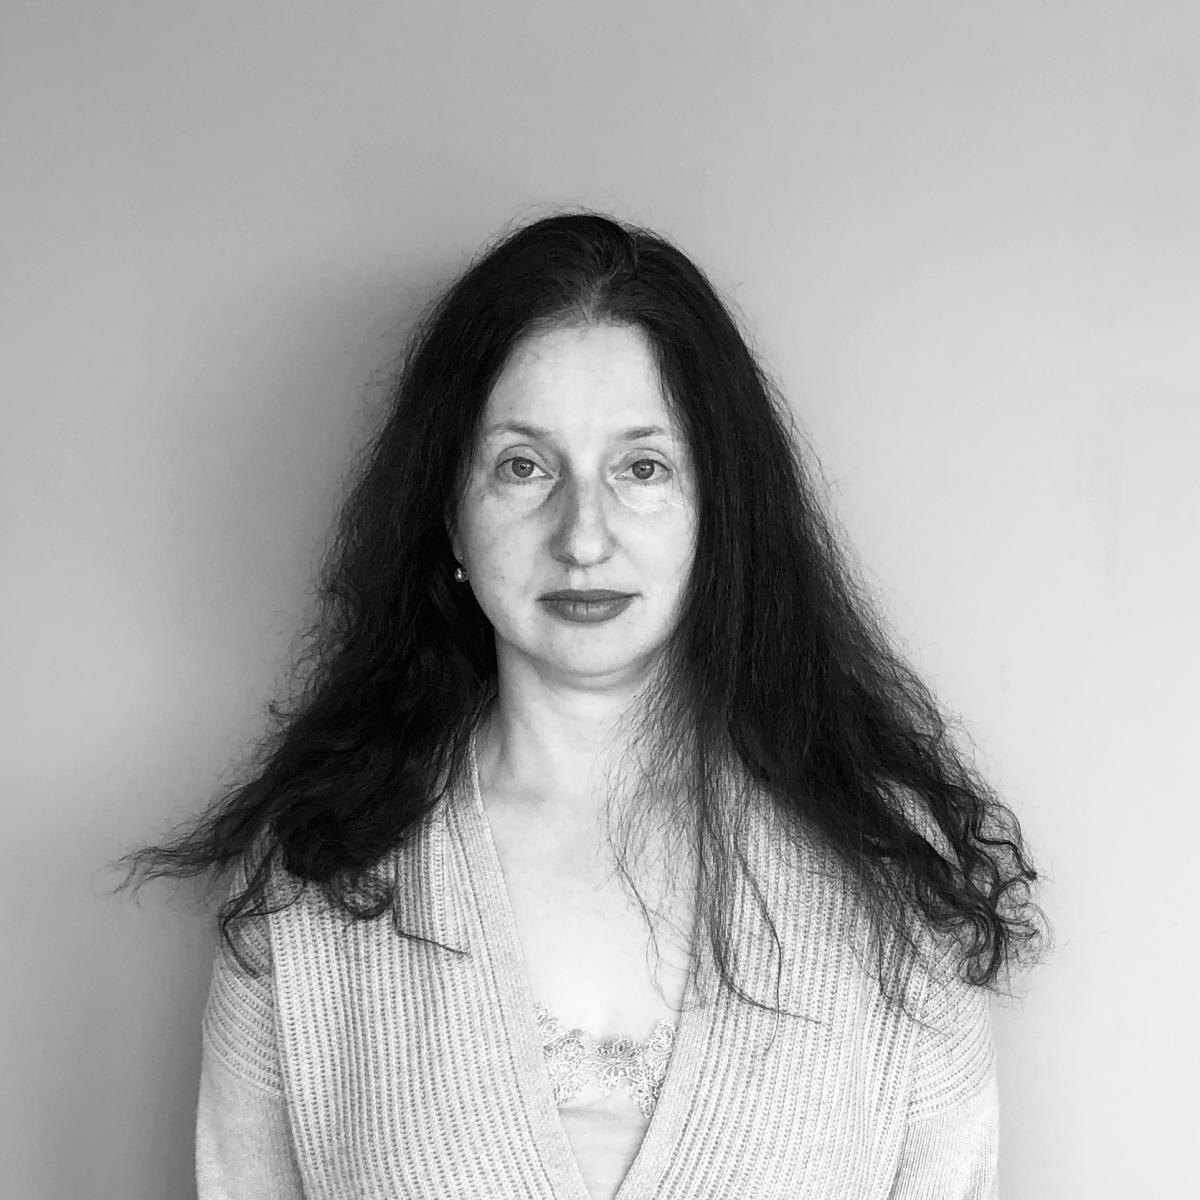 Anna-Maria Castro